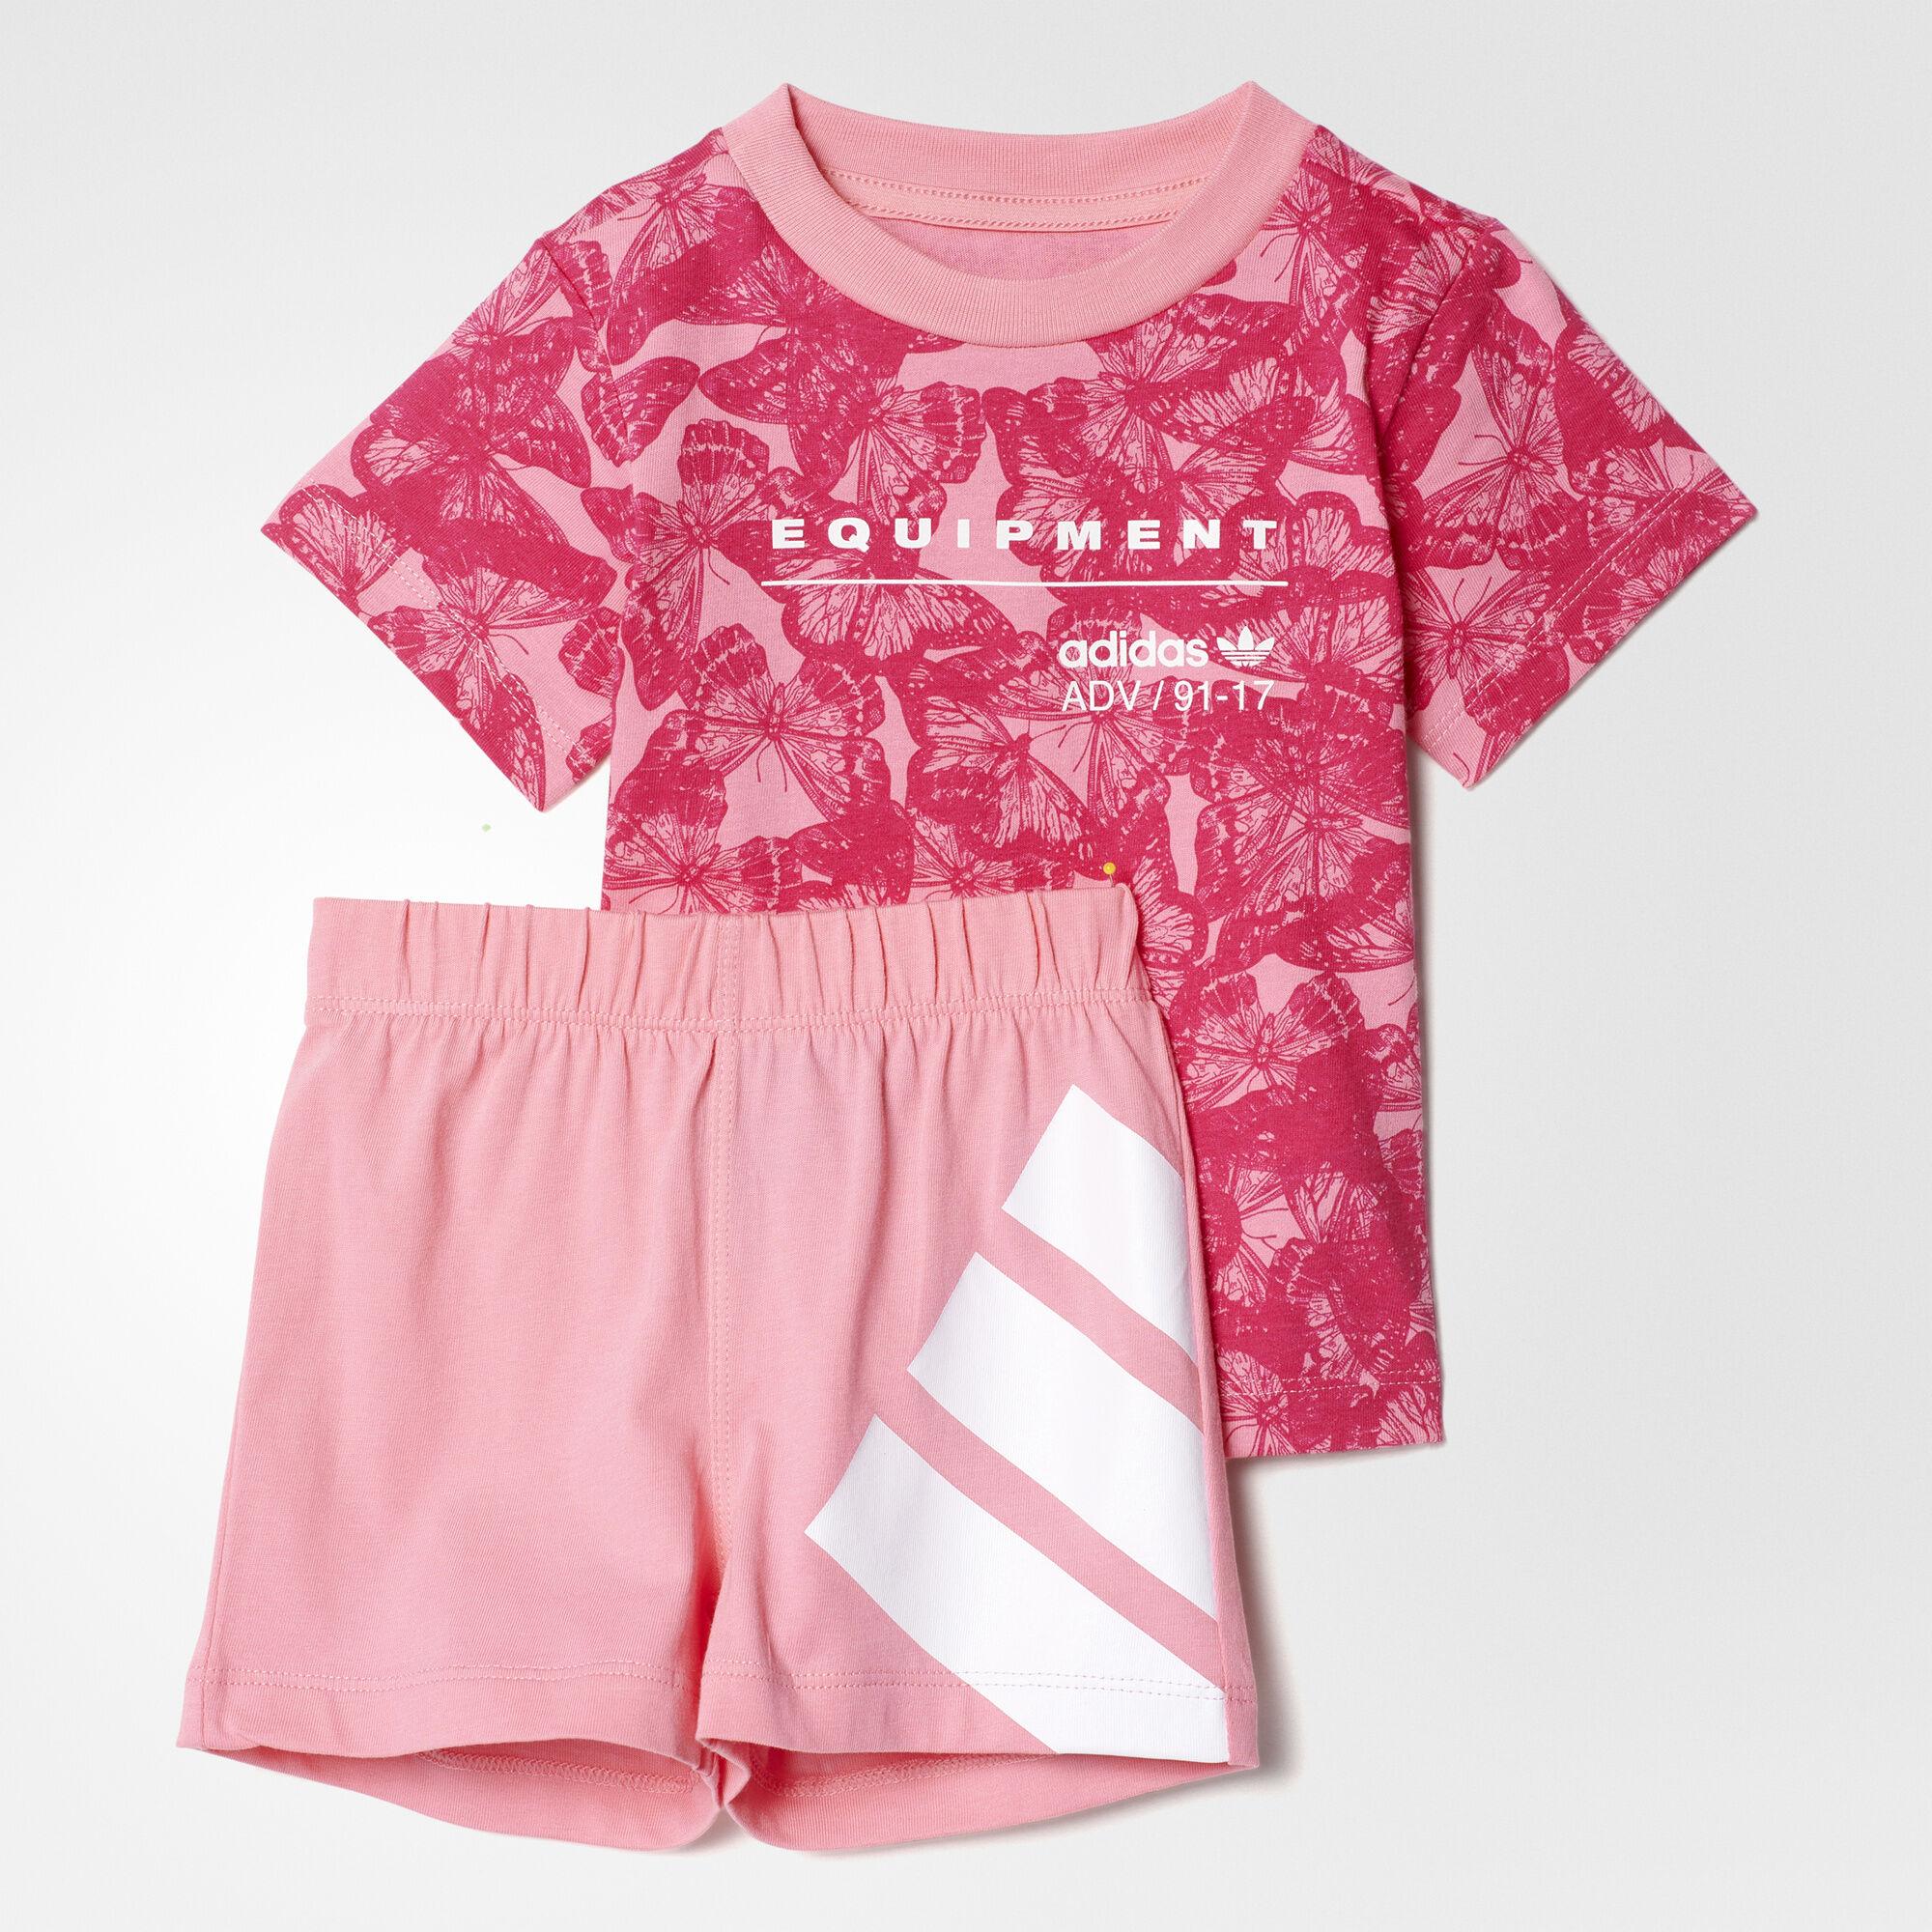 Adidas star wars sweatshirt Donna Pink cheap >il più grande off31%